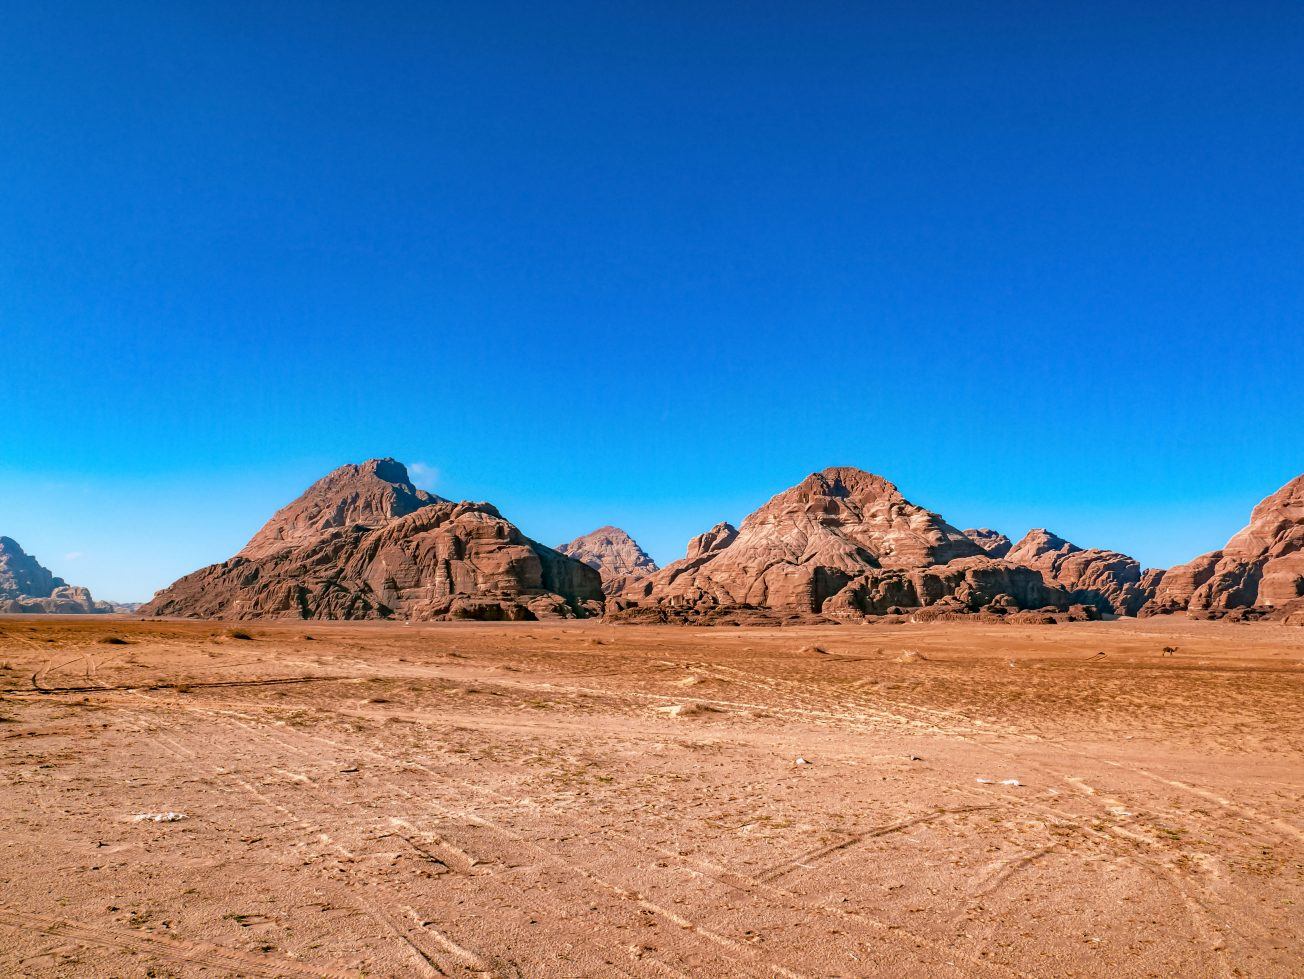 Jordánsko - púšť Wadi Rum